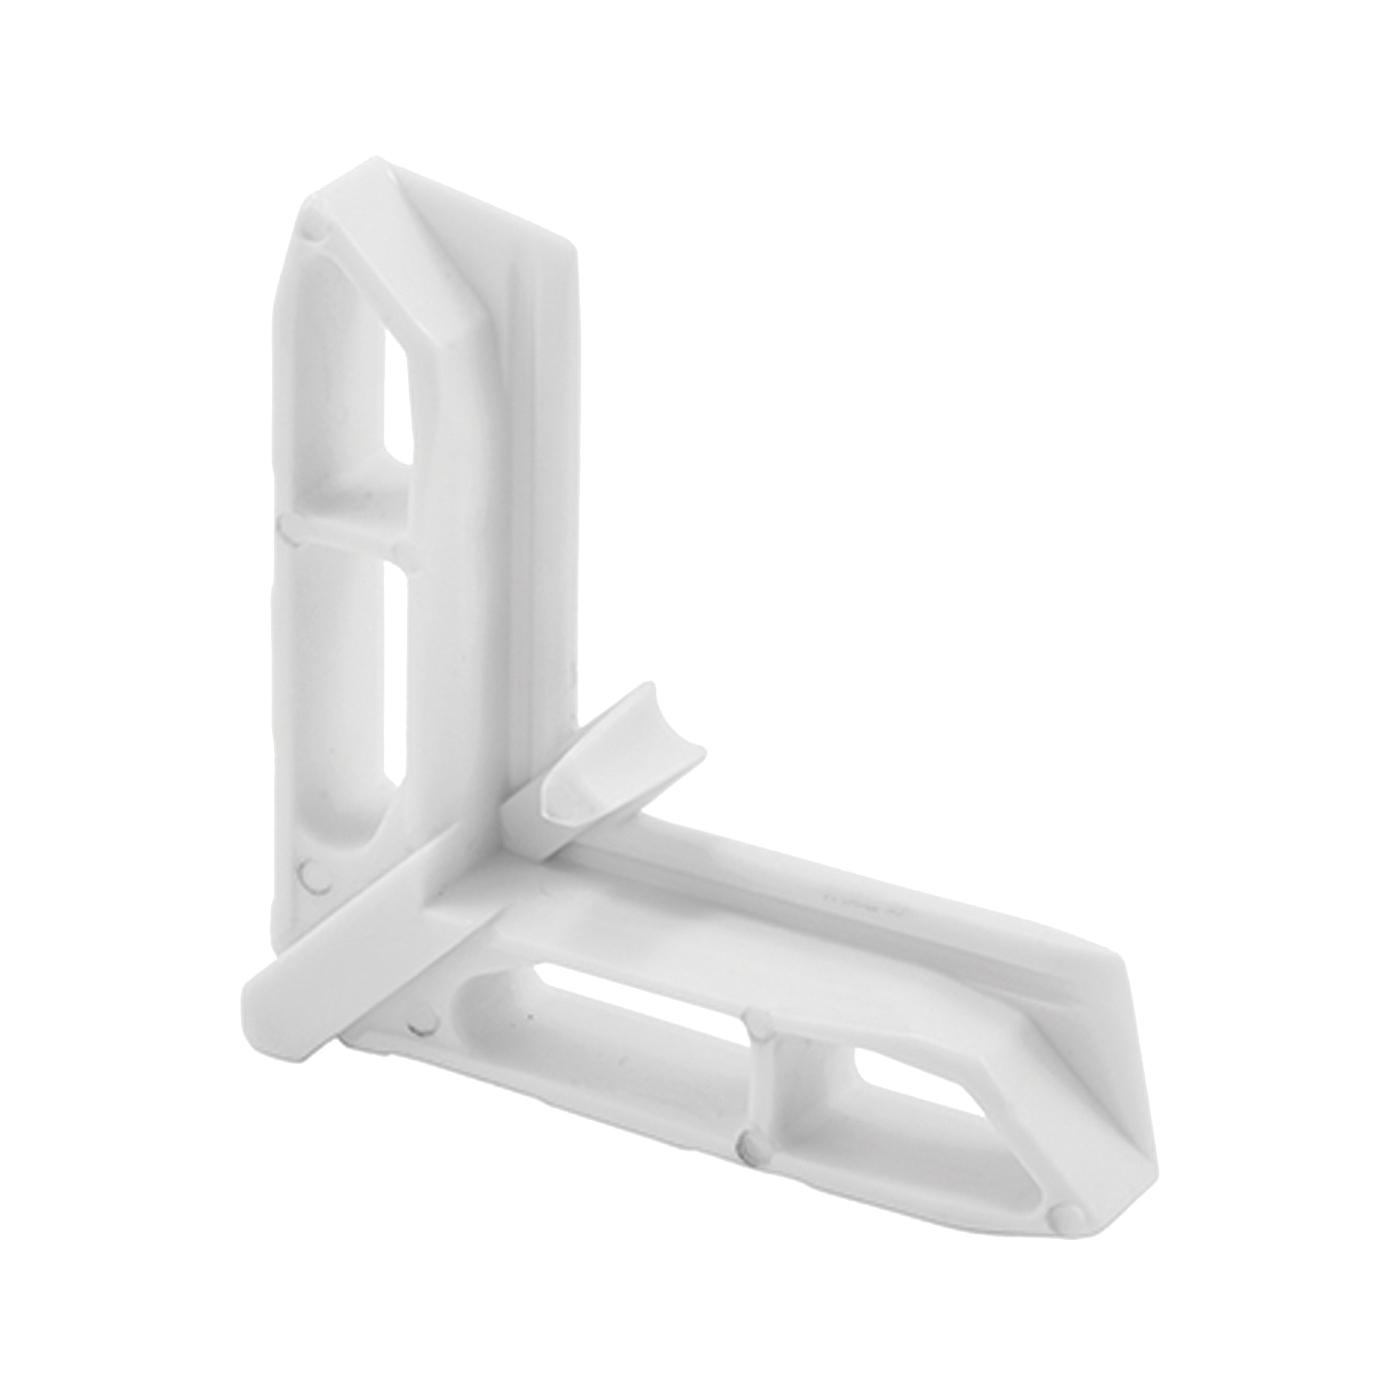 Picture of Make-2-Fit PL 15758 Screen Frame Corner, Plastic, White, For: Andersen Screen Frames, 20, Tub